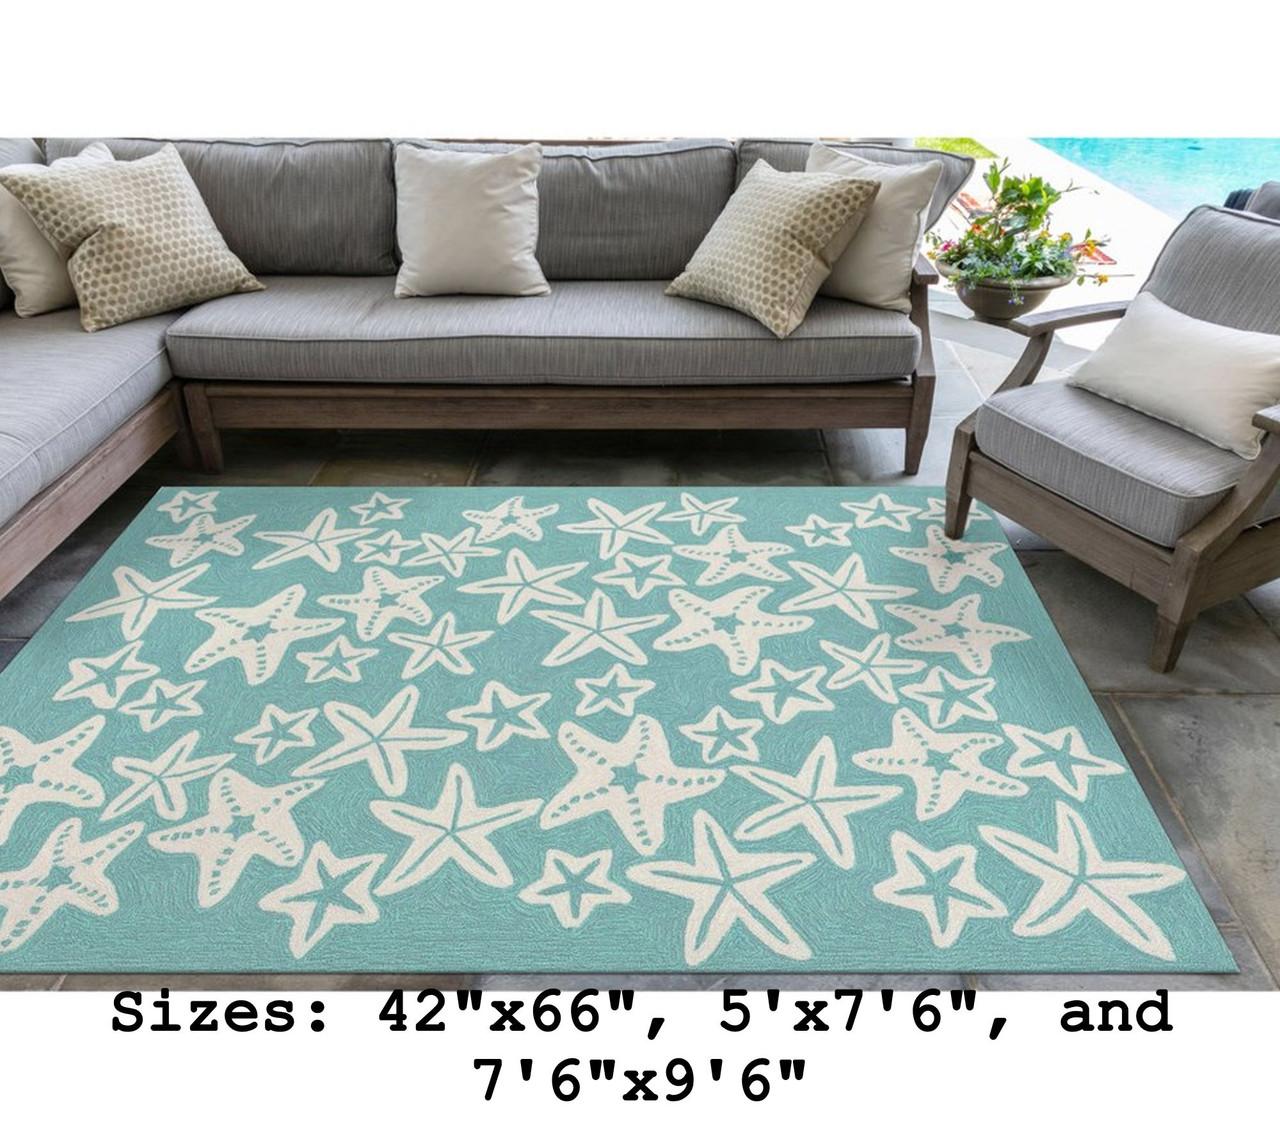 Aqua Capri Starfish Indoor/Outdoor Rug - Large Rectangle Lifestyle